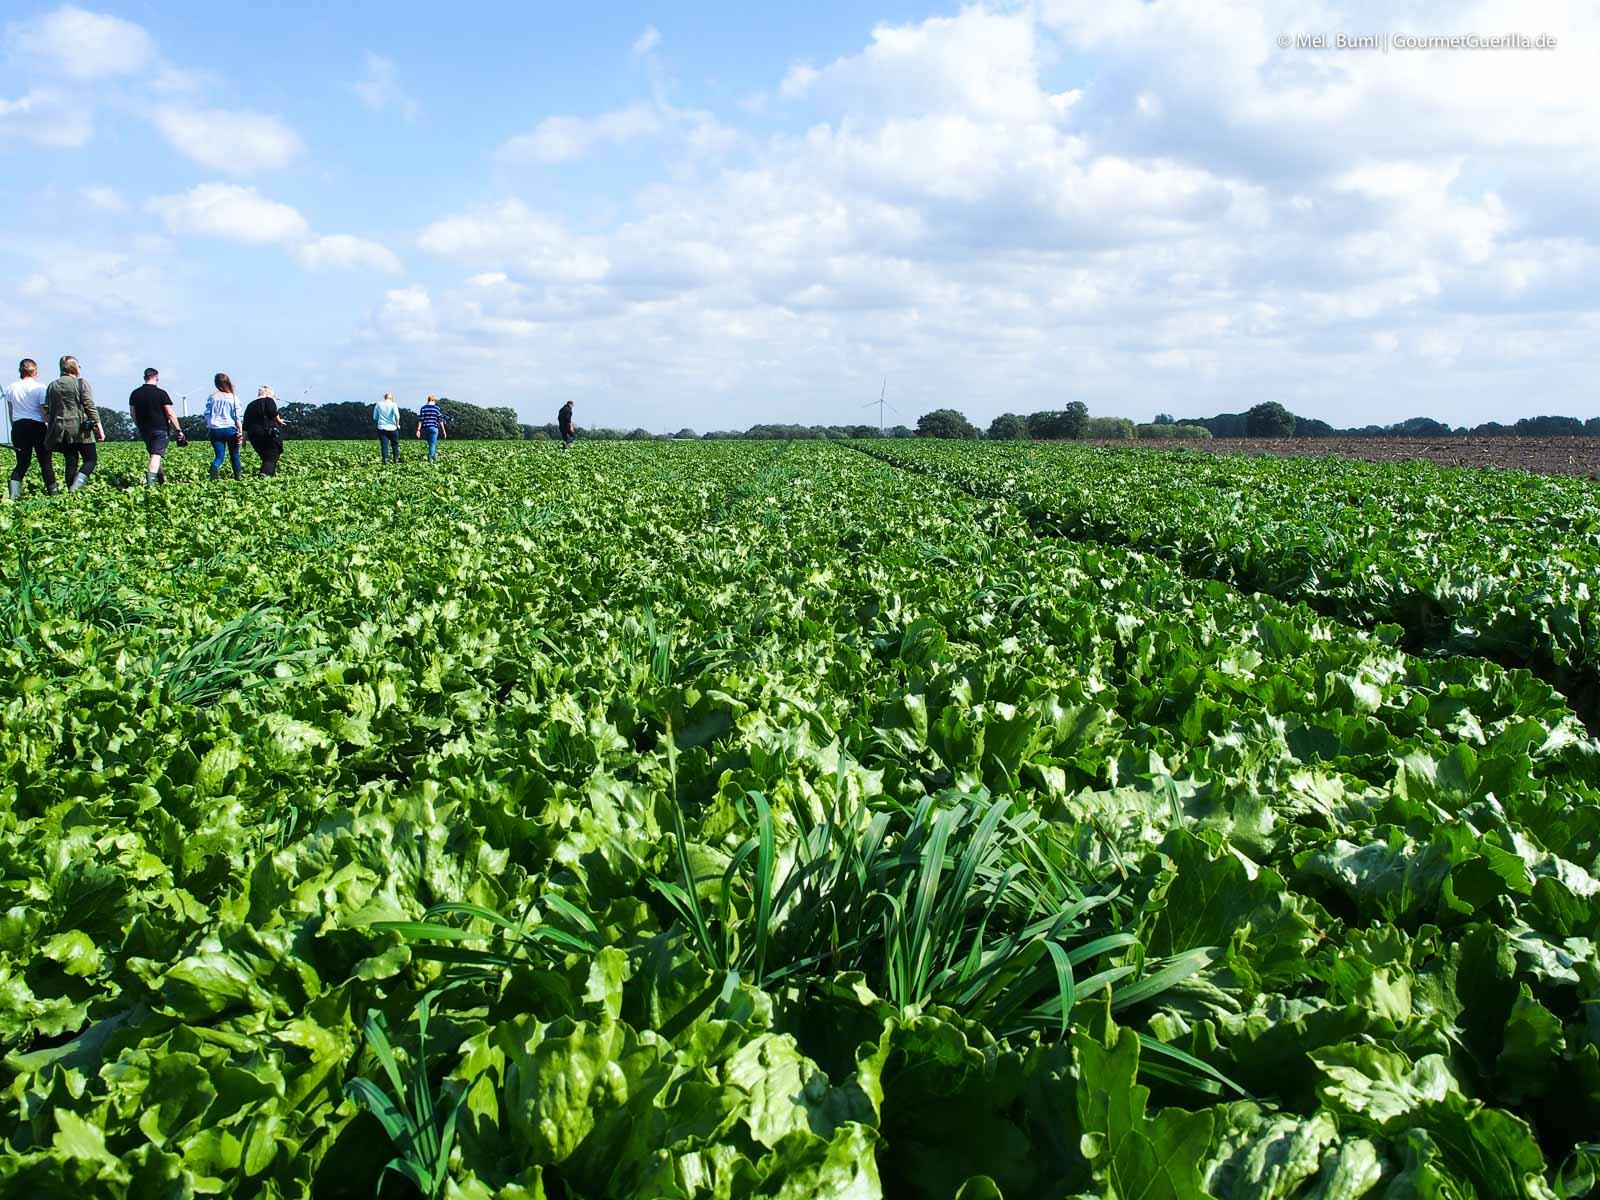 Eisbergsalat auf dem Feld Bonduelle Academy Salat Anbau und Verarbeitung |GourmetGuerilla.de